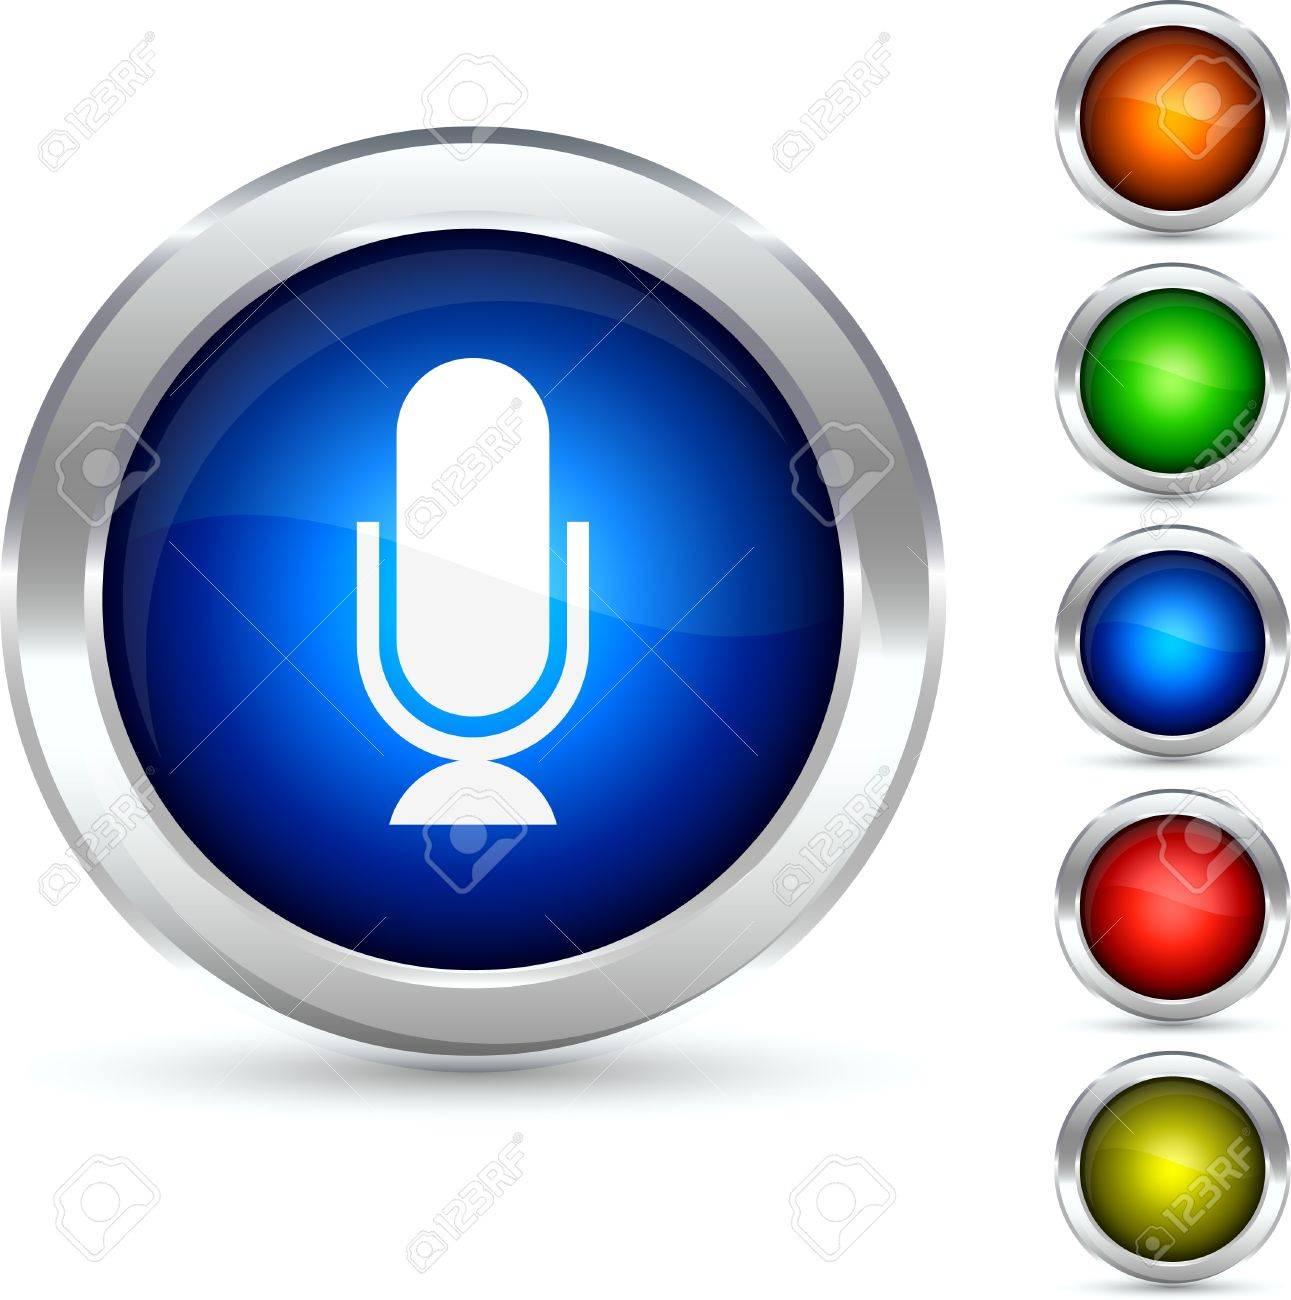 Mic detailed button. Vector illustration. Stock Vector - 5307863